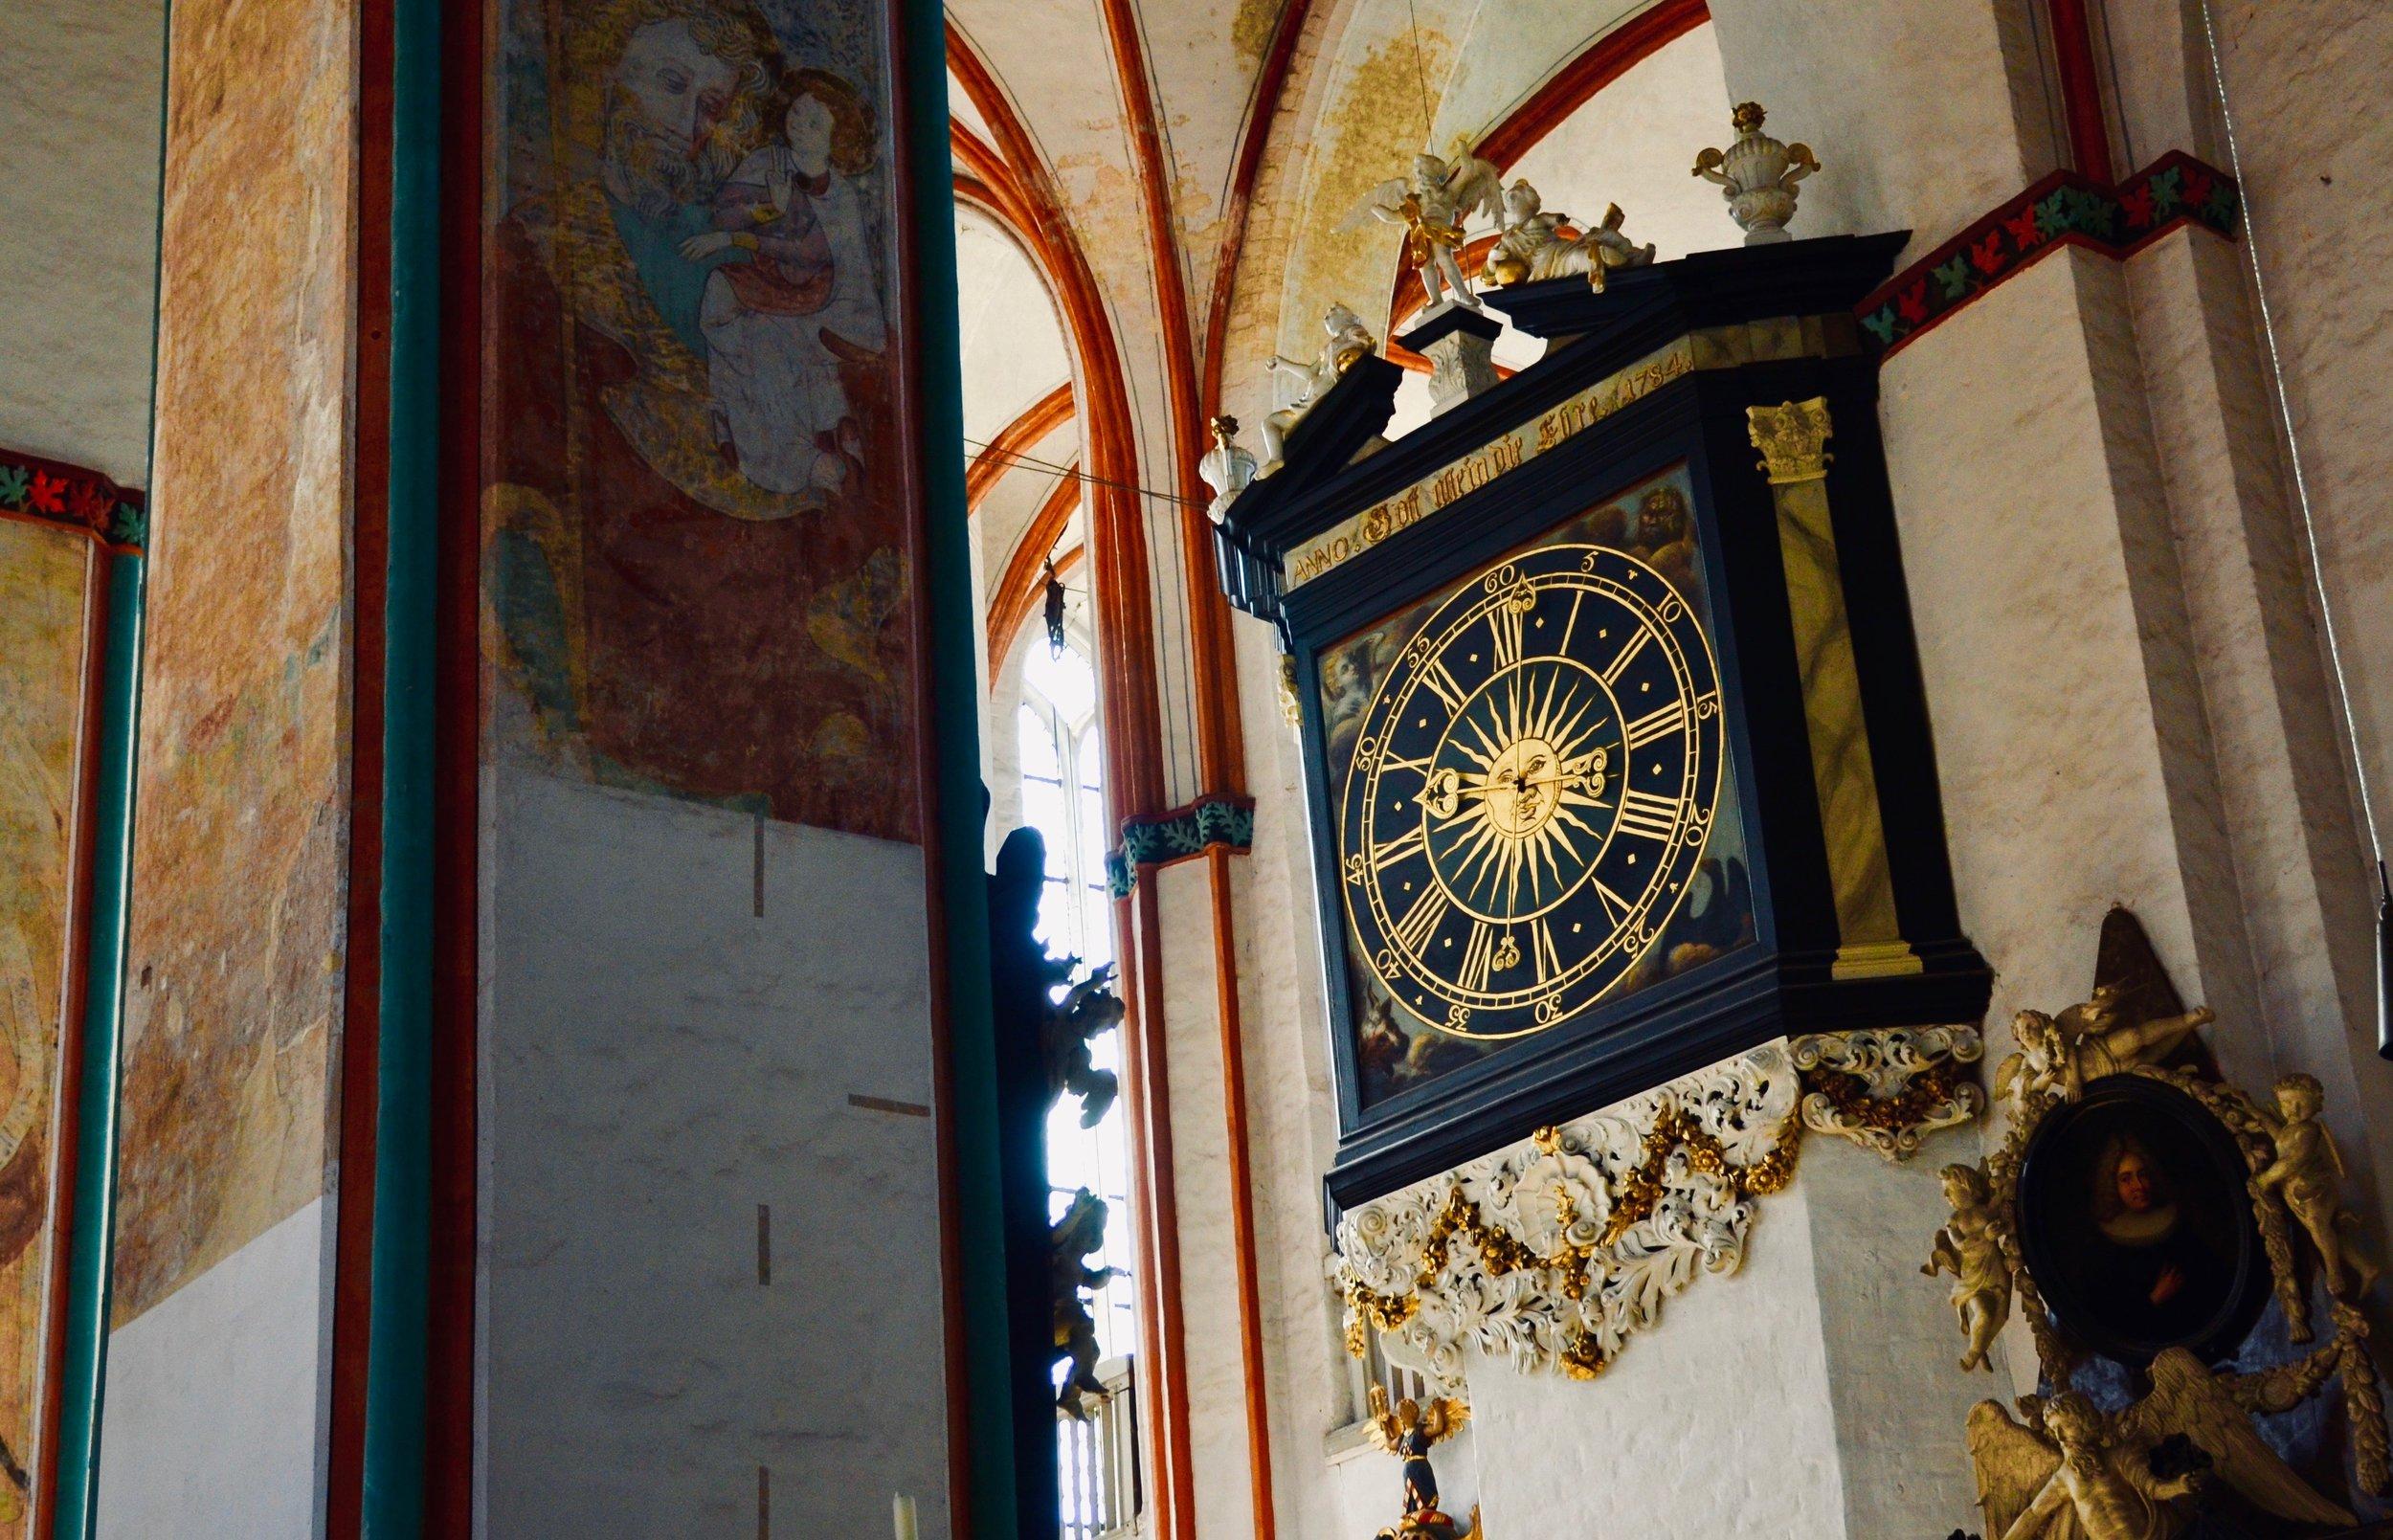 St. Jakobi, Lübeck.